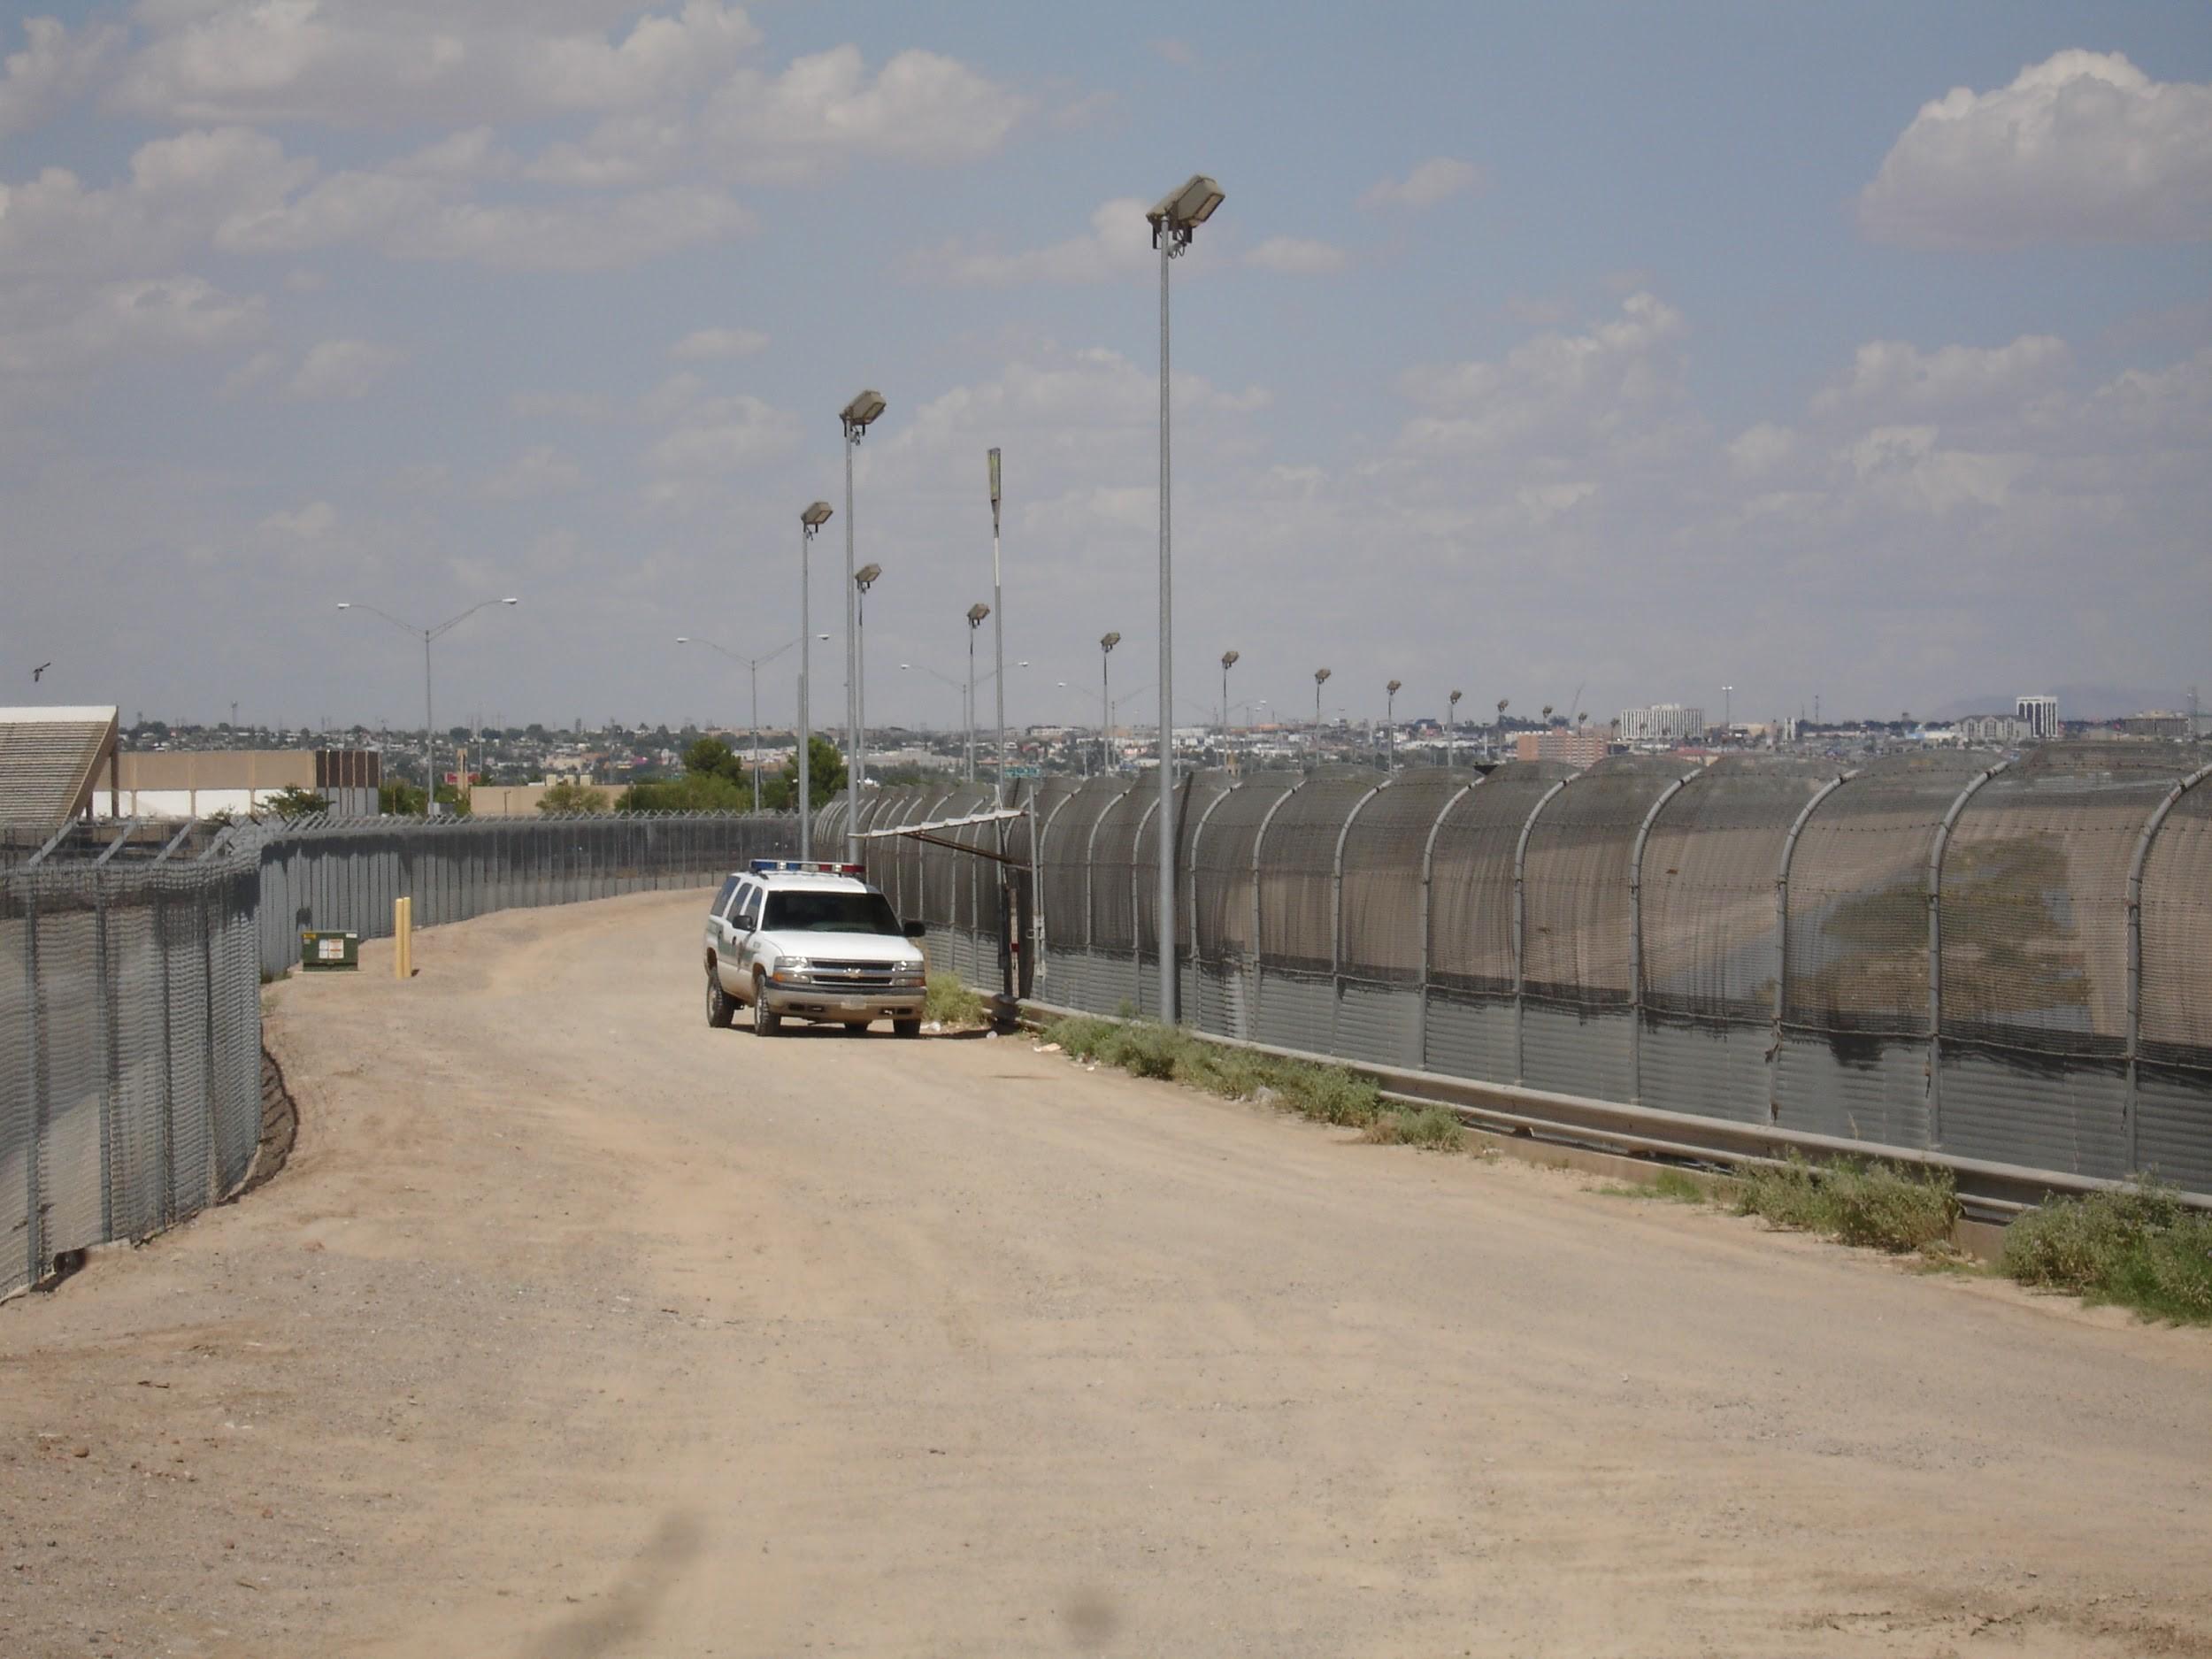 The U.S.-Mexico border fence near El Paso, Texas, in 2007.